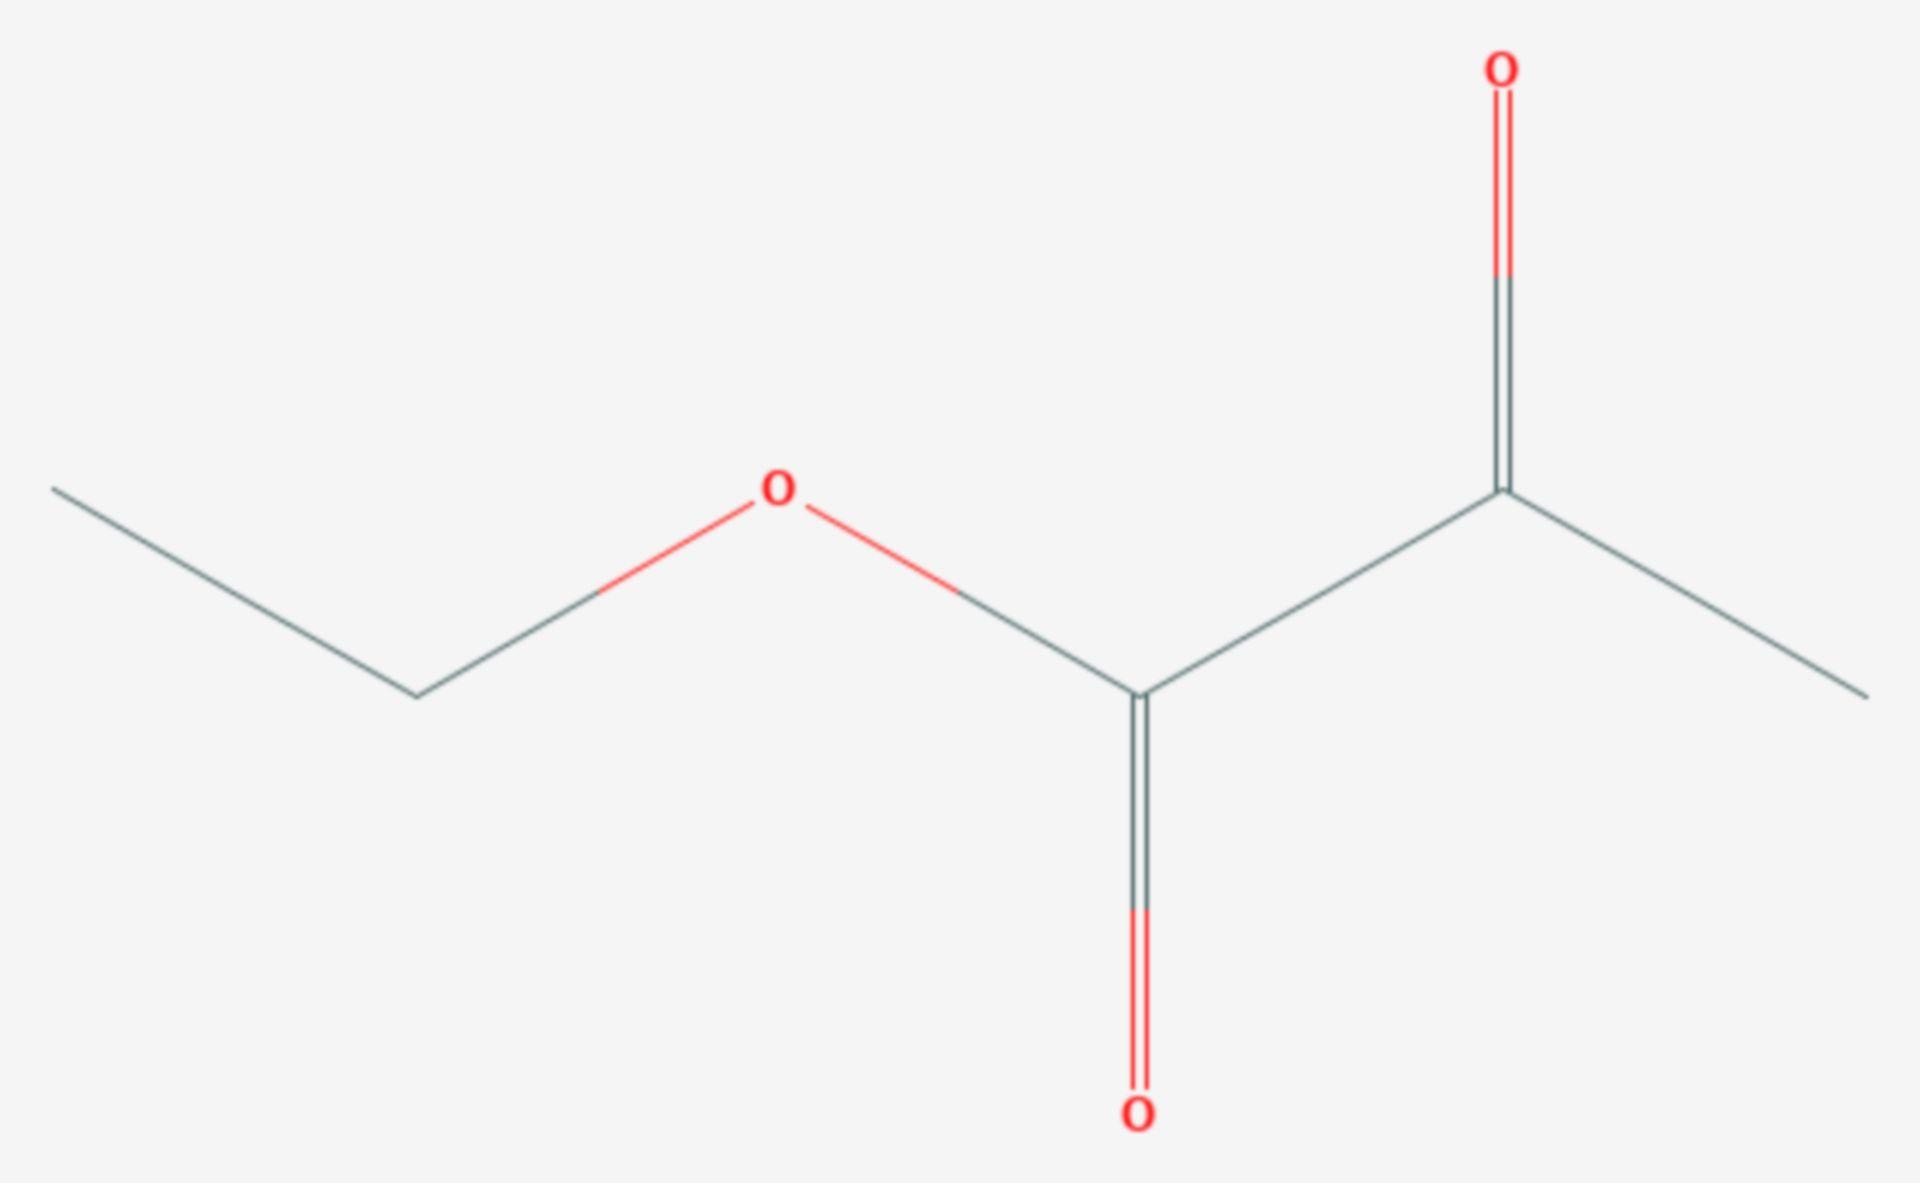 Brenztraubensäureethylester (Strukturformel)